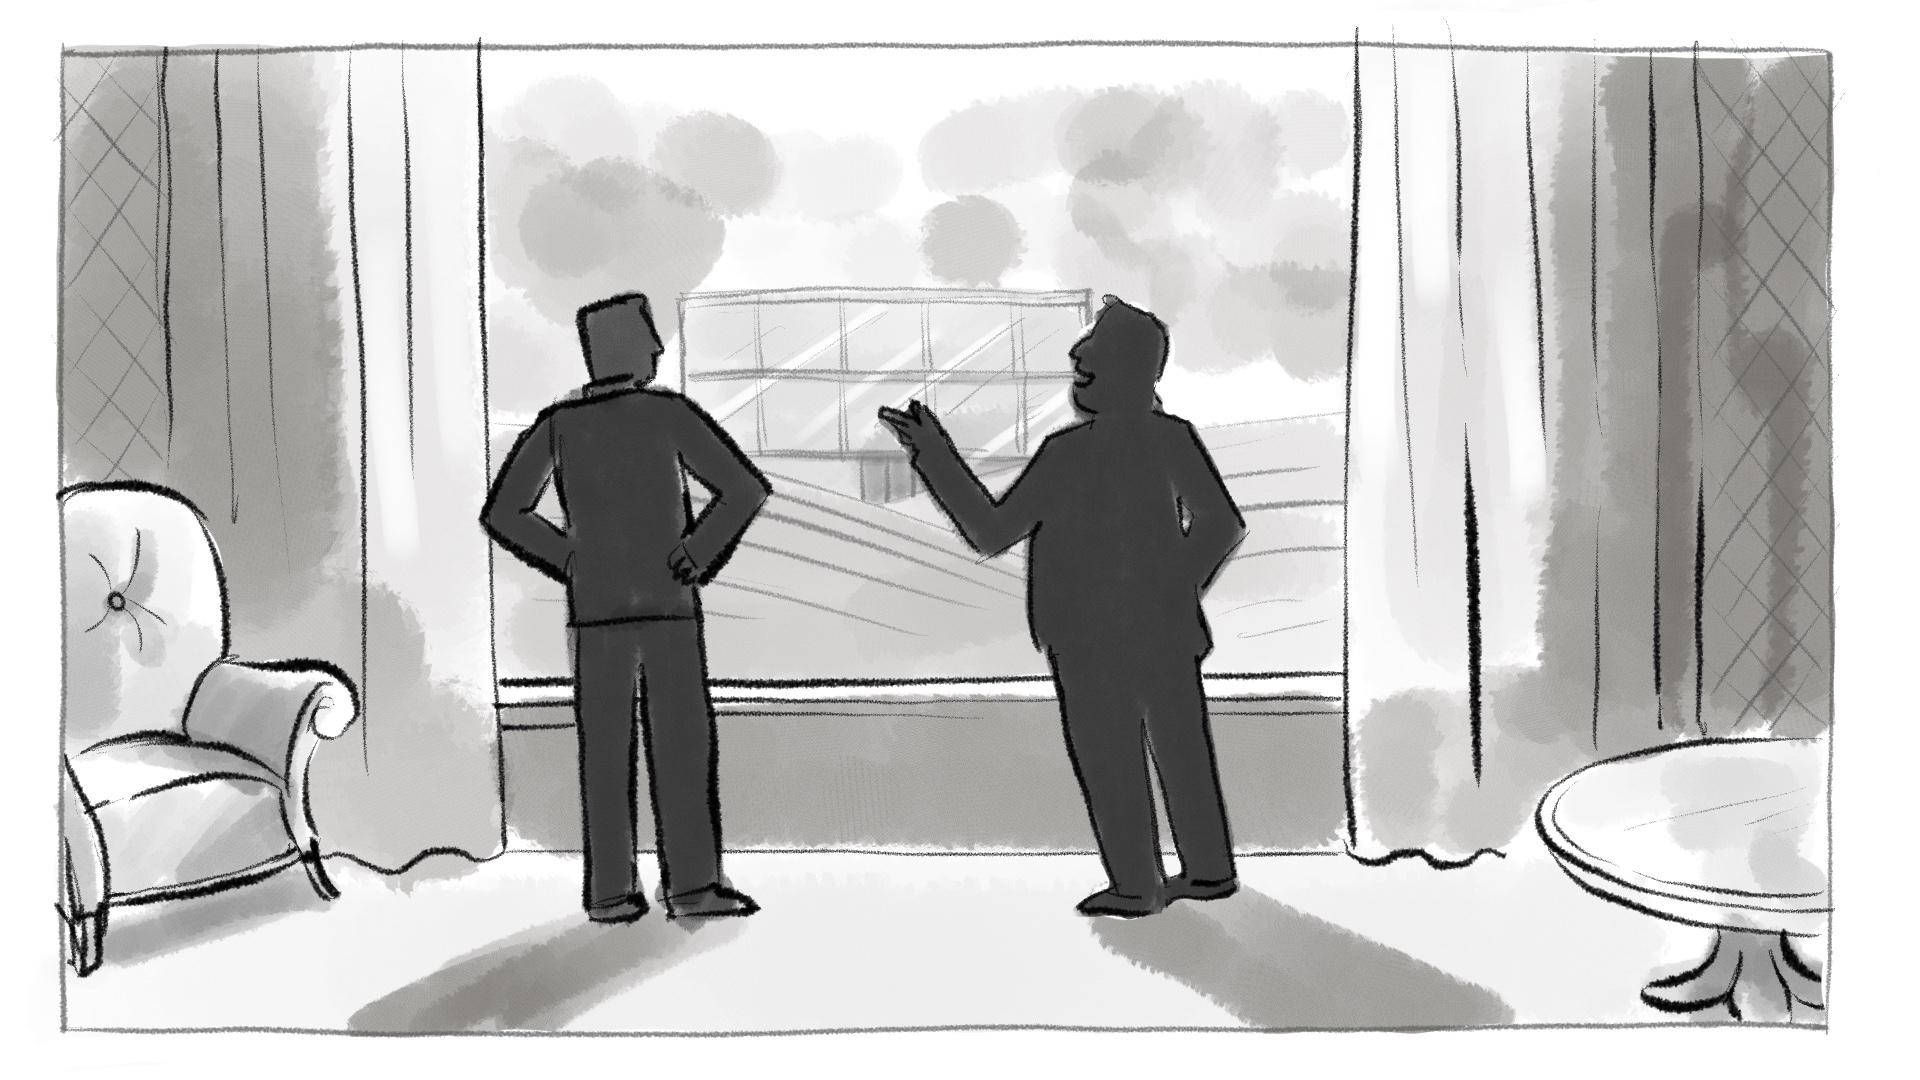 Shahidi_Storyboards_4c-6.jpg